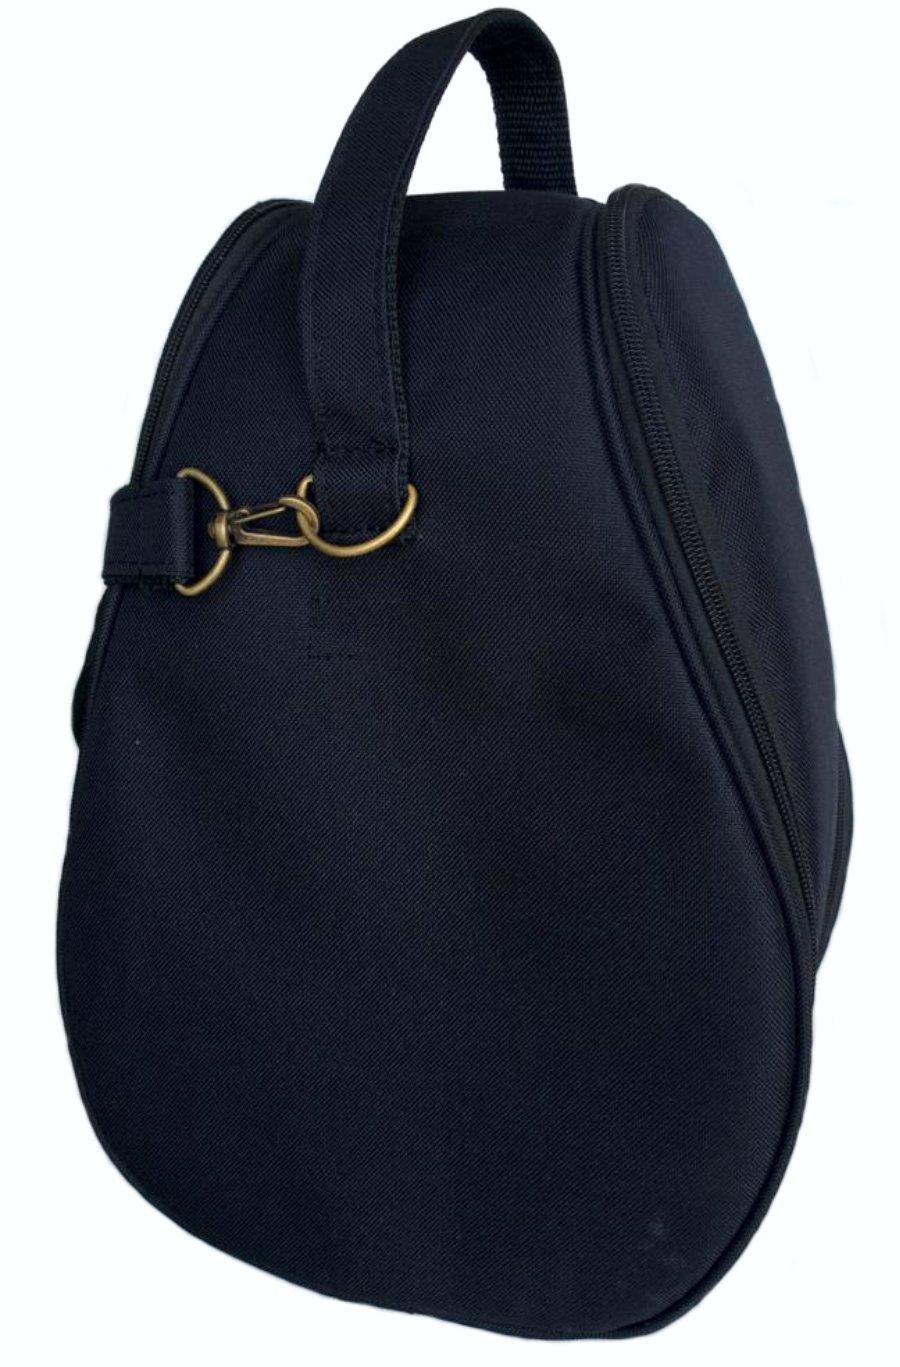 Bolso matero cordura o polycamvas personalizado (EMT209) - Fianchini